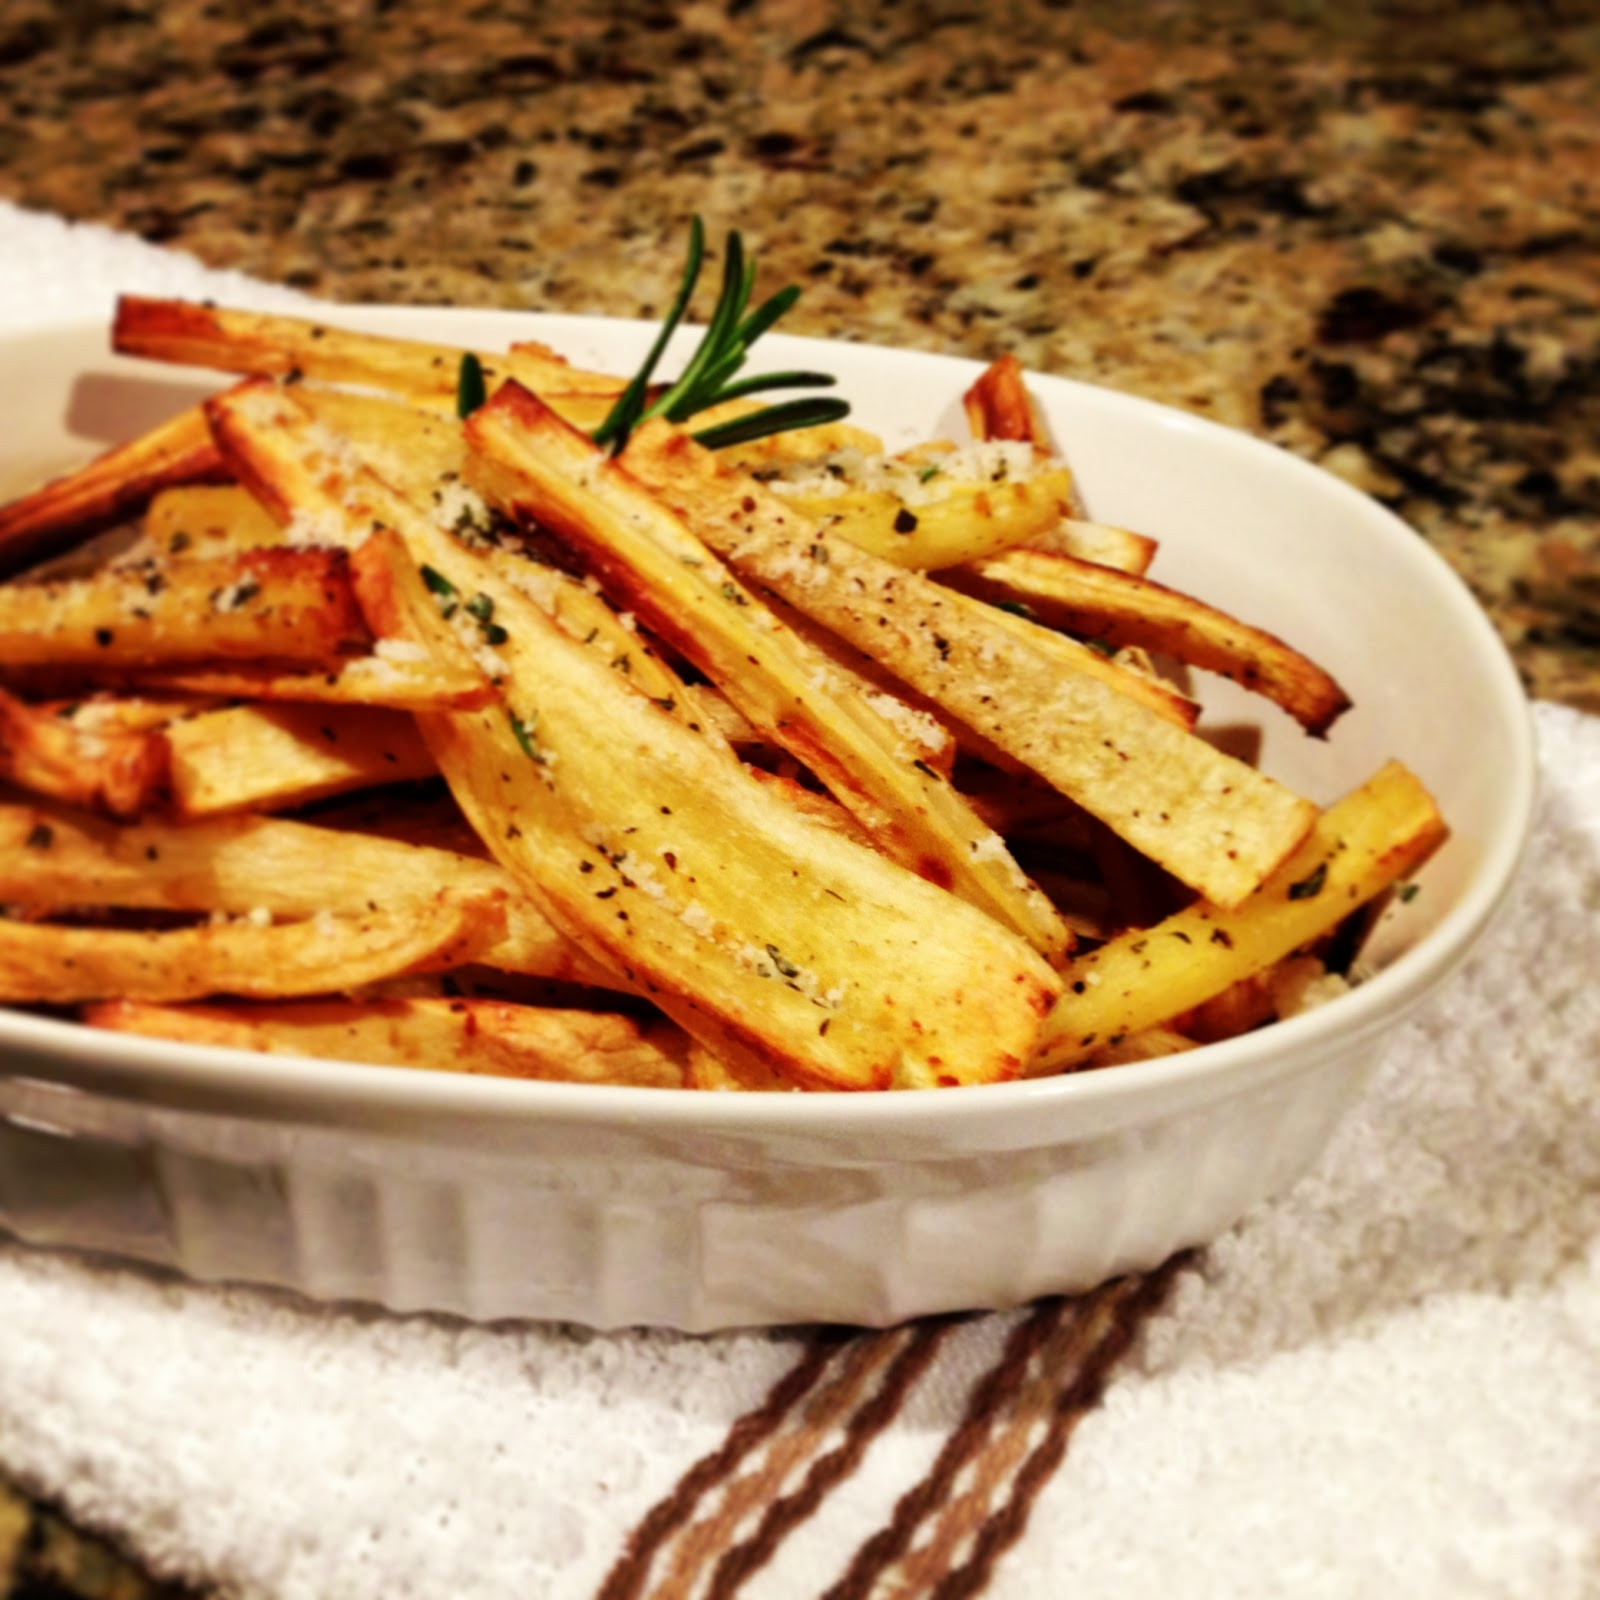 Parsnip Chips Clean baked parsnip fries